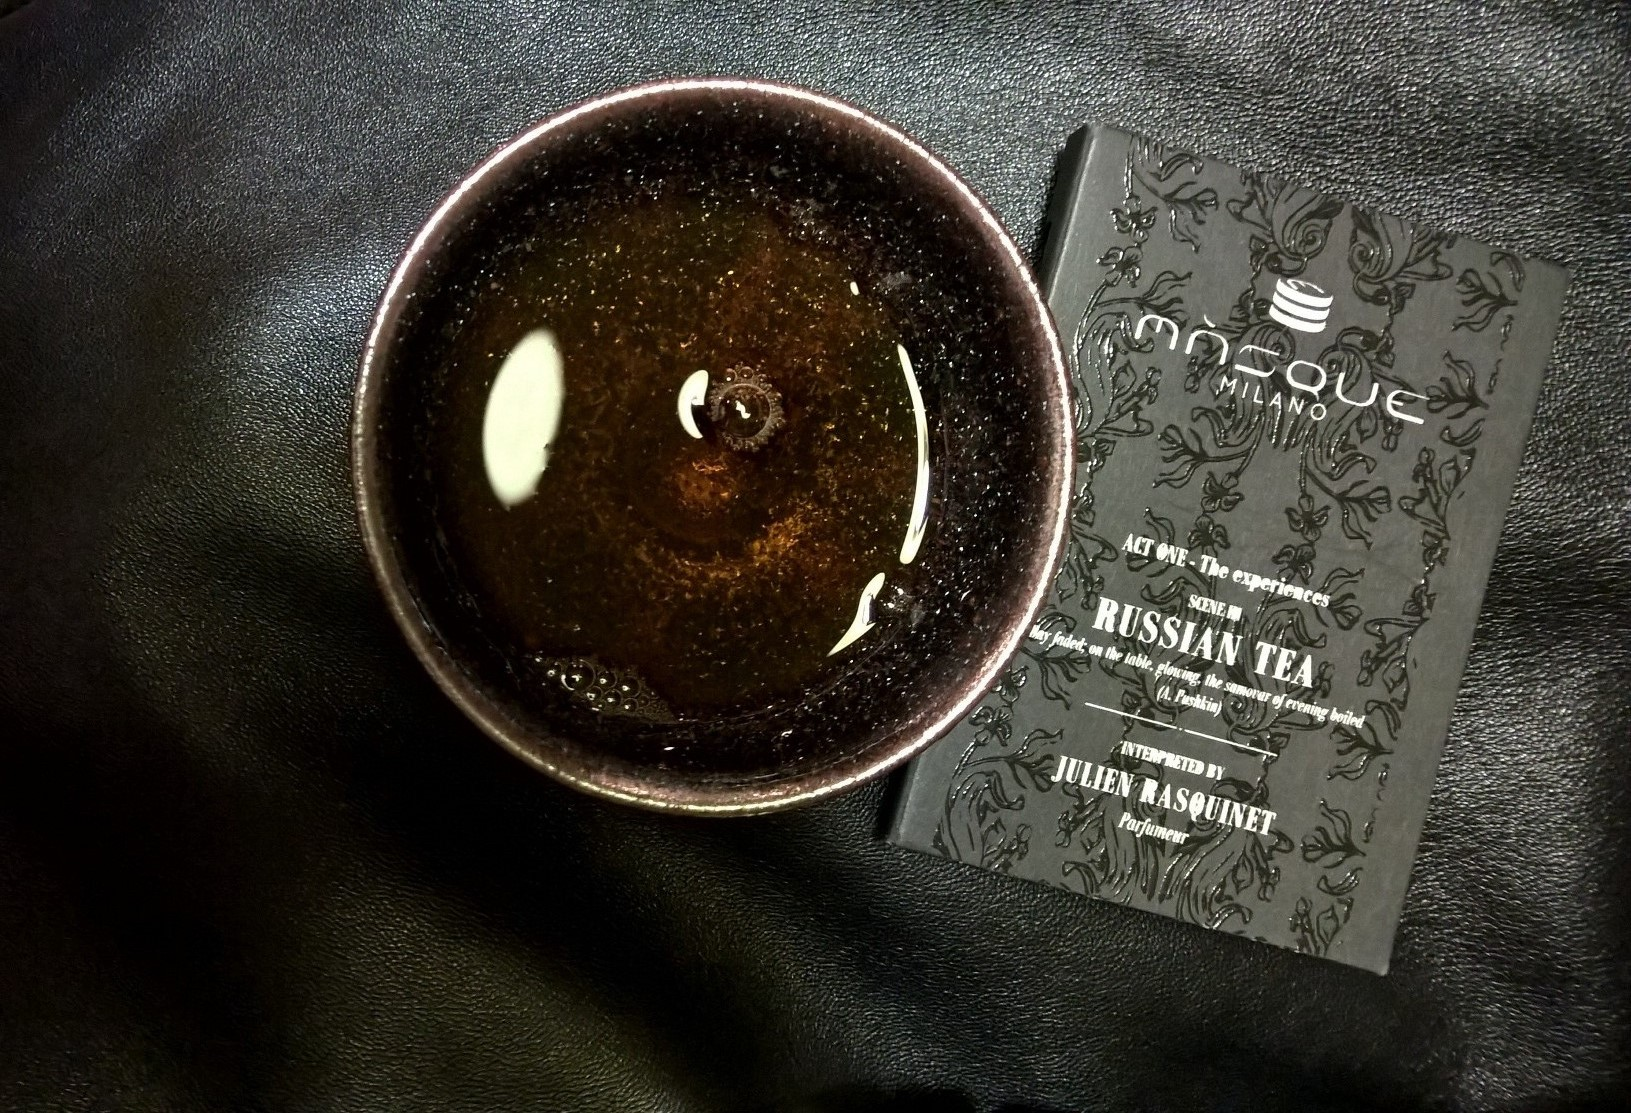 masque milano_russian tea_frangipani.cz (3)